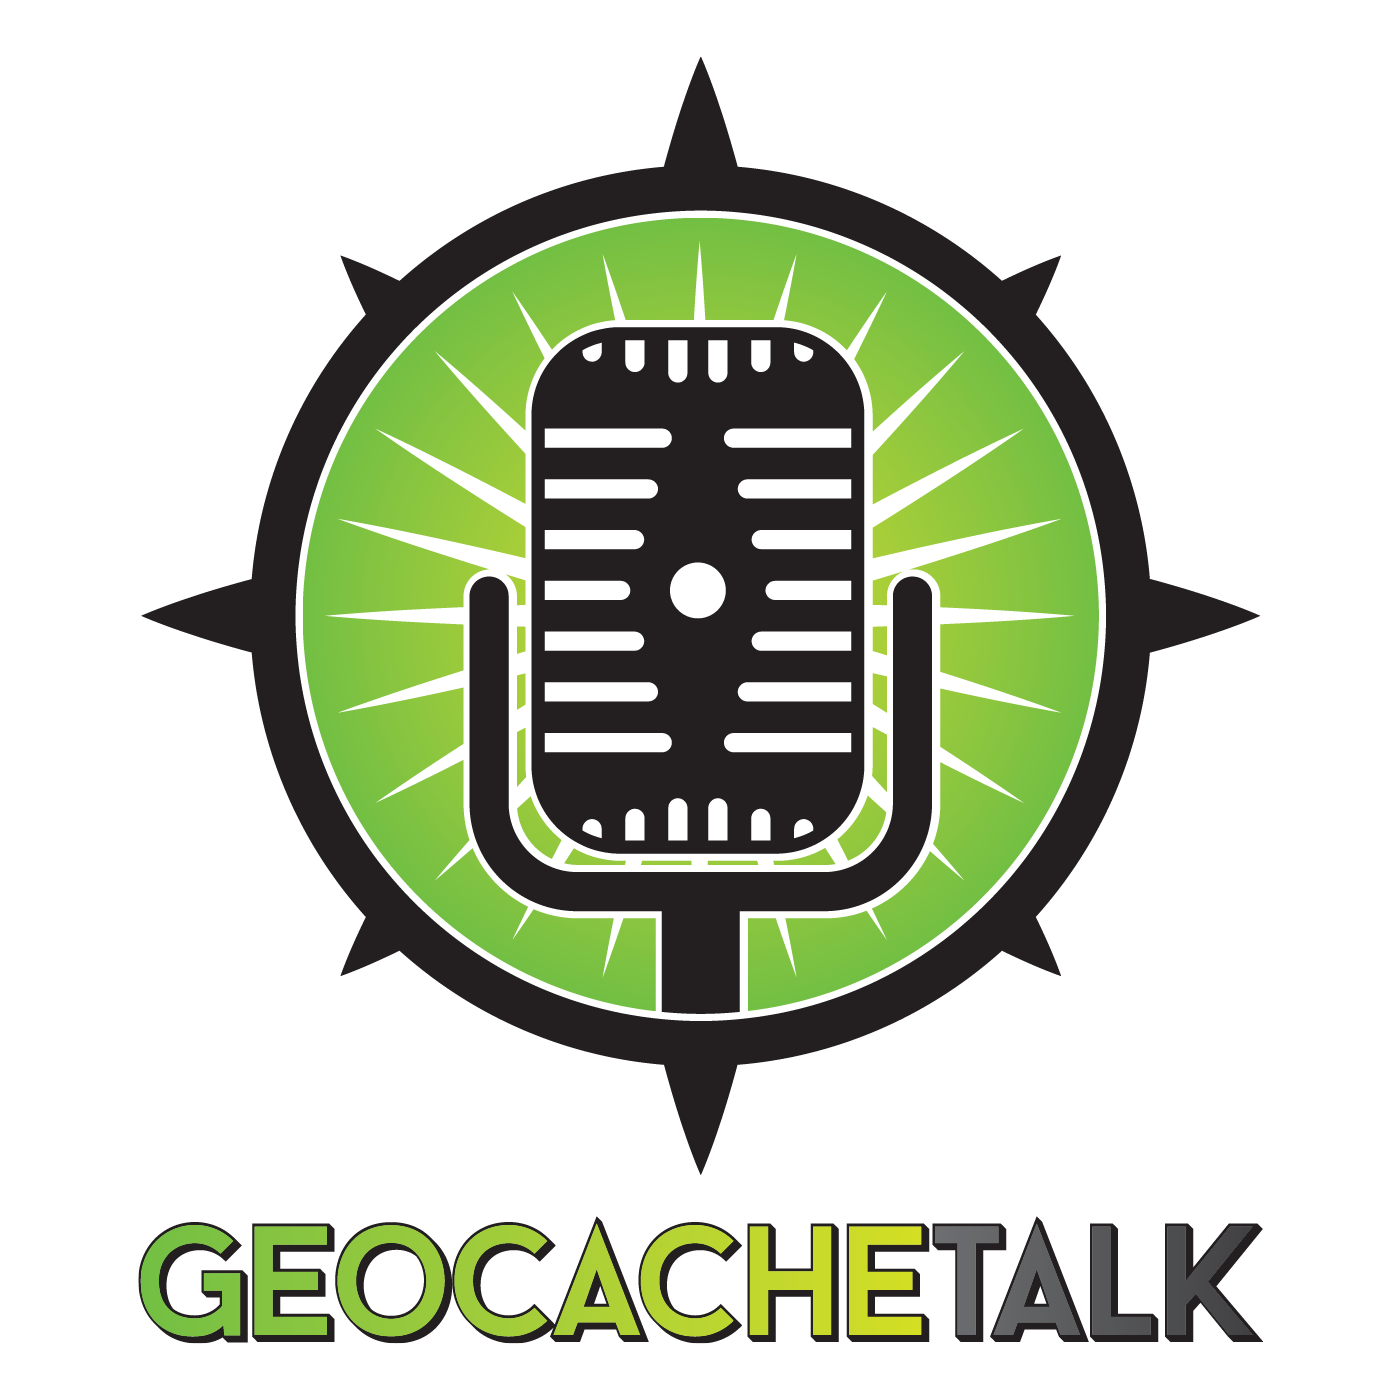 Geocache Talk